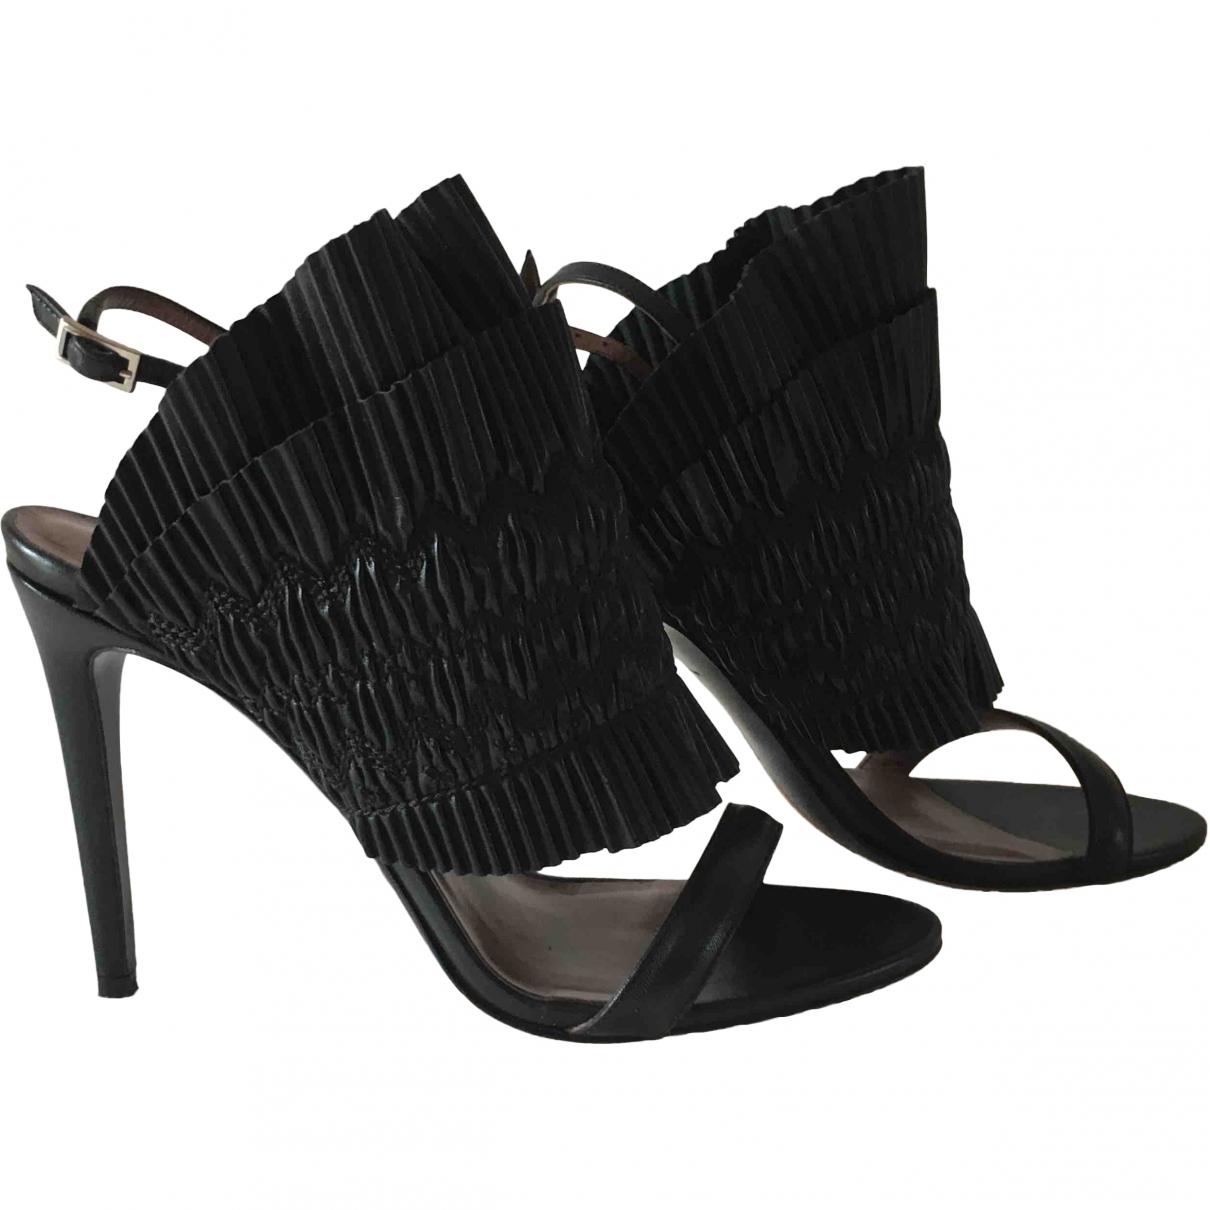 Tabitha Simmons \N Black Leather Sandals for Women 39 EU